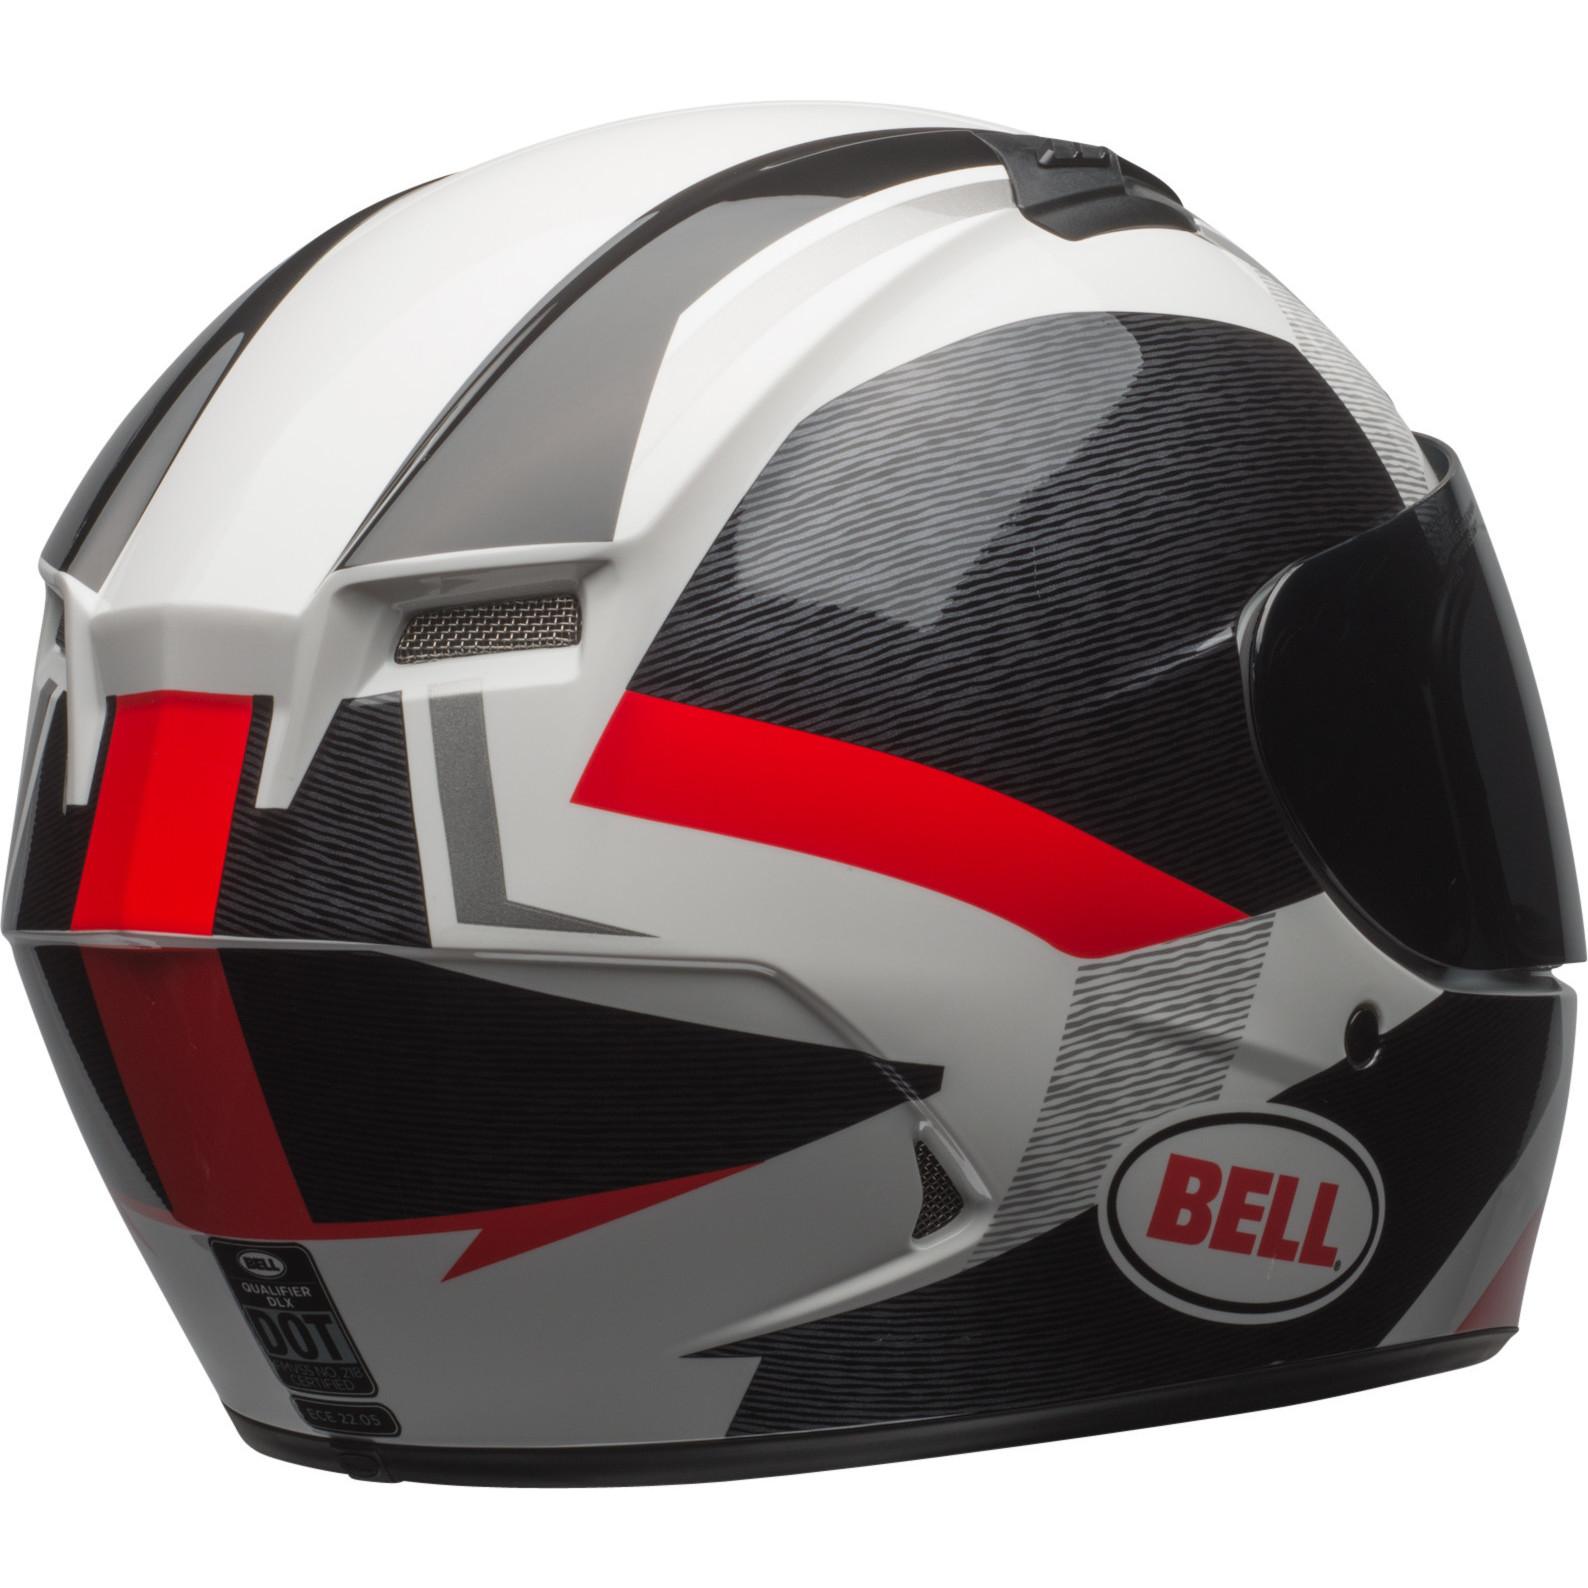 Bell Qualifier DLX MIPS Accelerator Red//Black Sports Motorcycle Motorbike Helmet